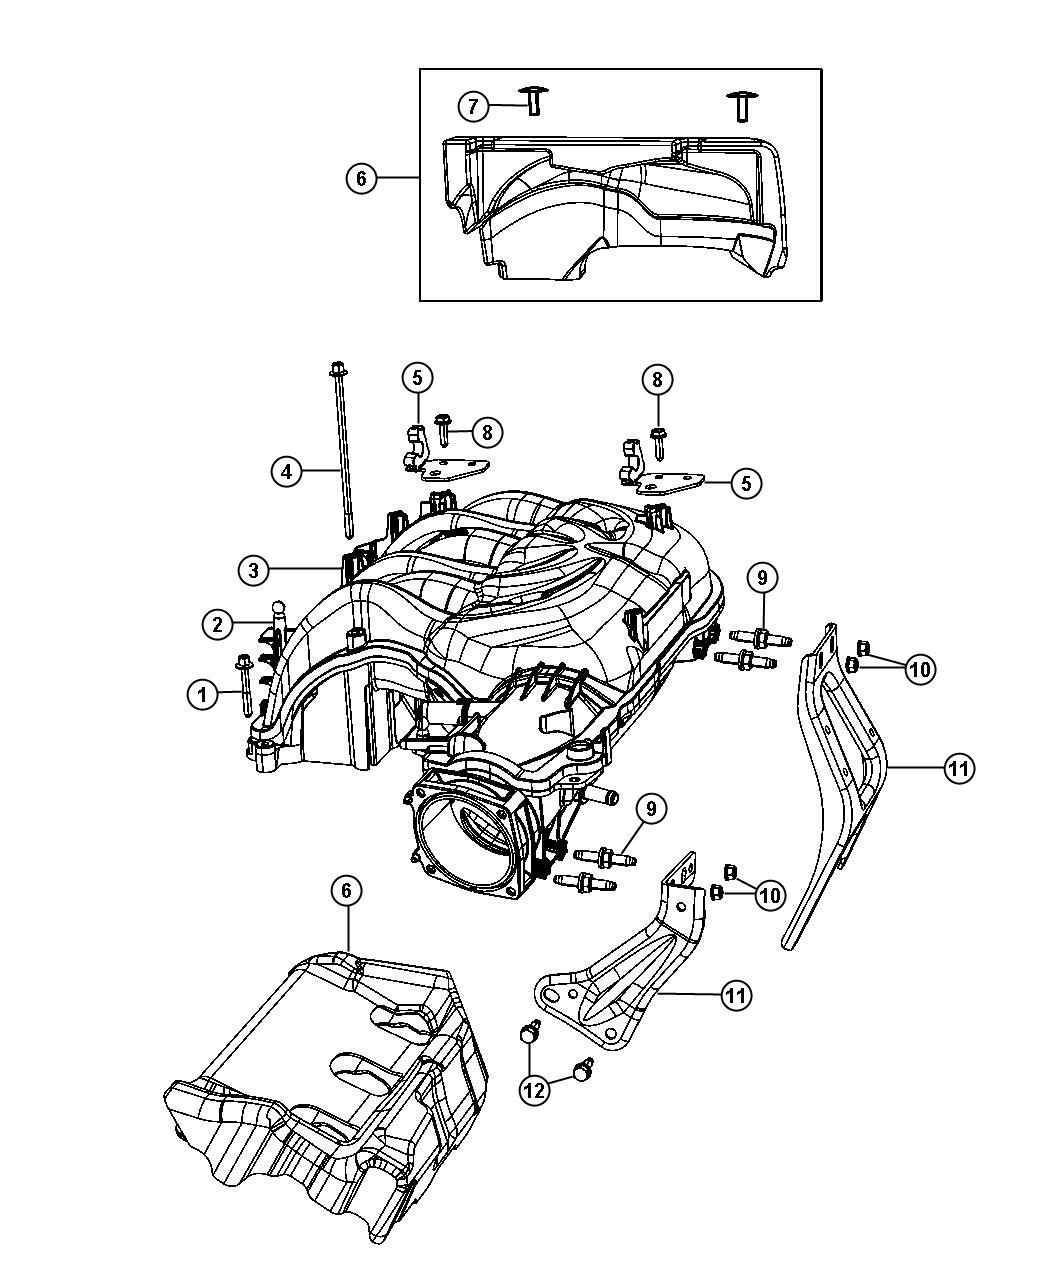 Jeep Wrangler Pad Lower Engine Under Intake Plenum